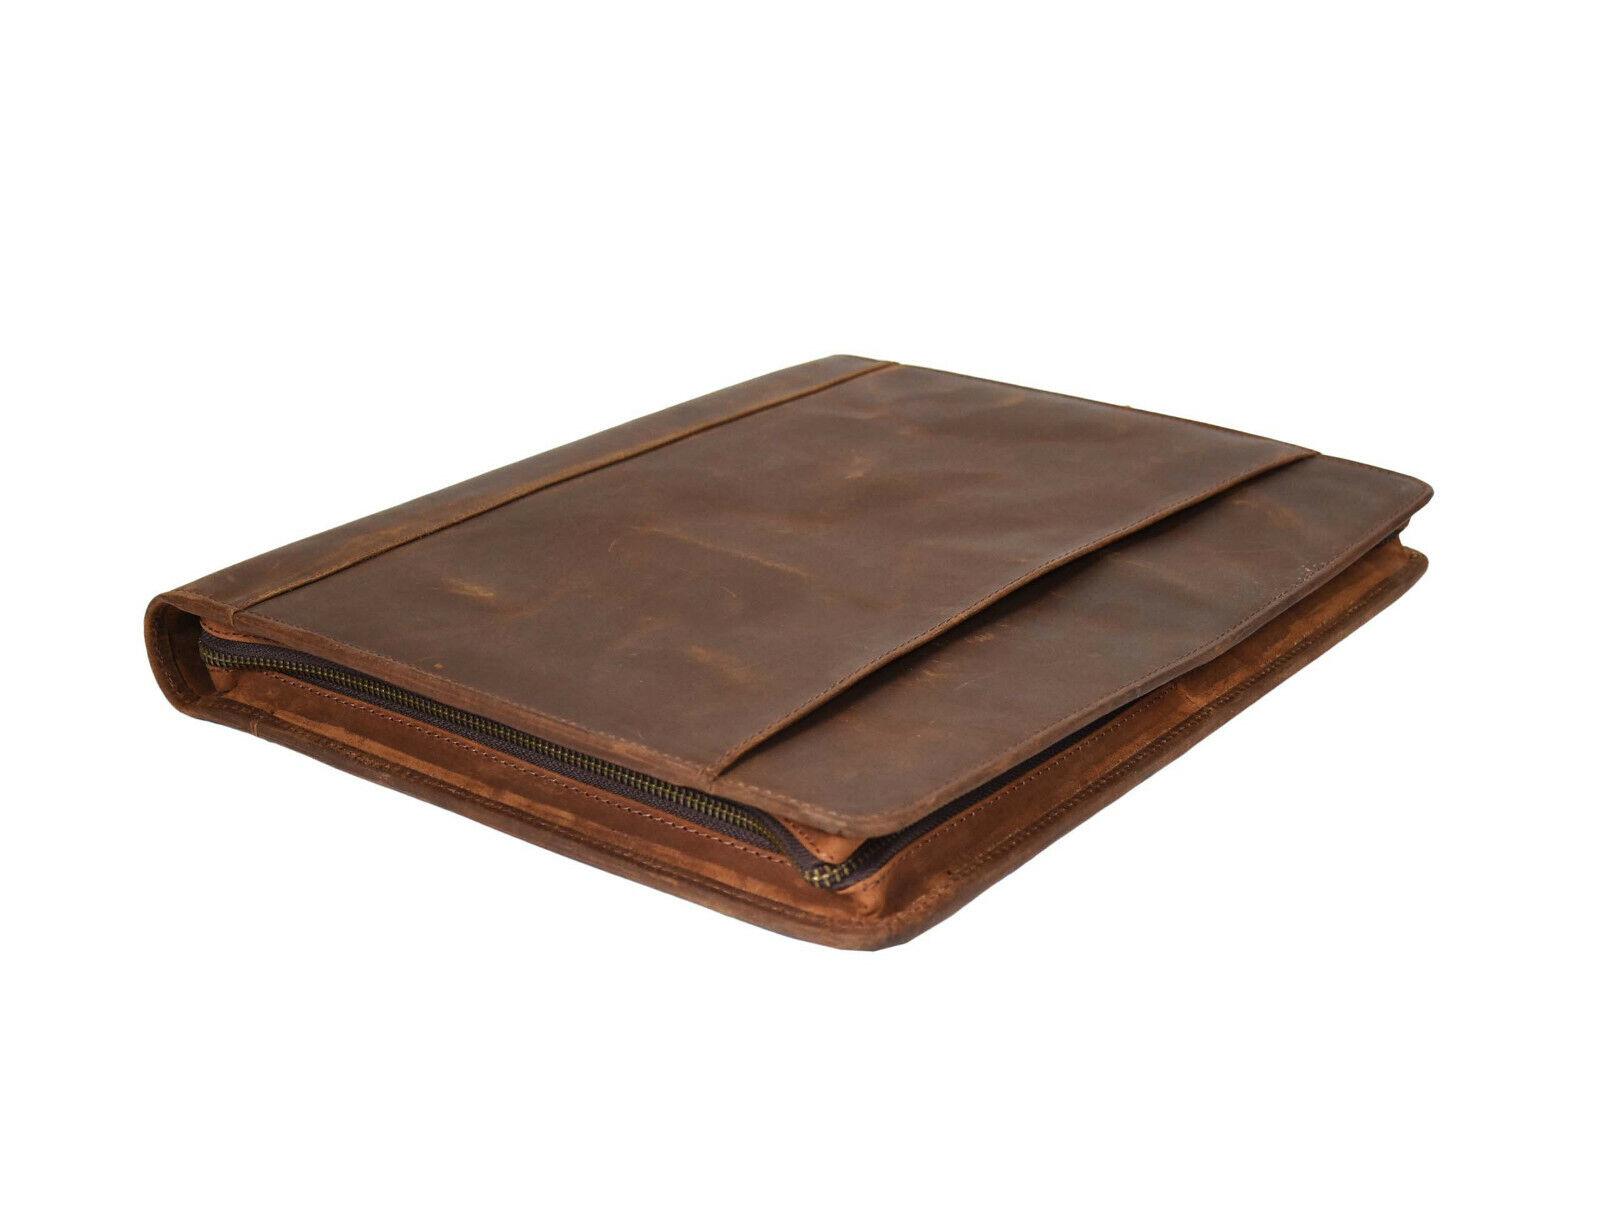 Vintage Leather Portfolio Padfolio Executive Organizer Folde